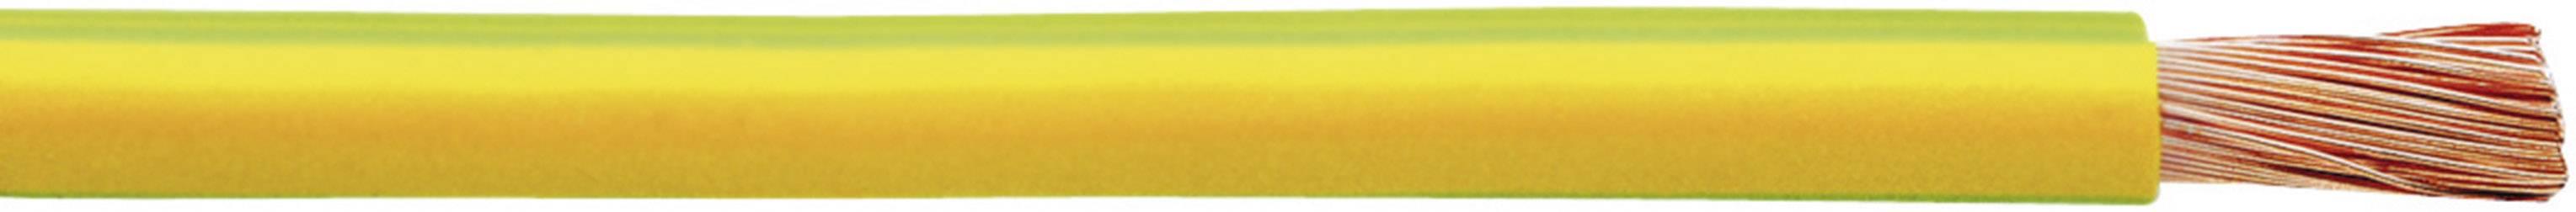 Pletenica H07V-K 1 x 1.50 mm, zelena-rumena Faber Kabel 040031 100 m